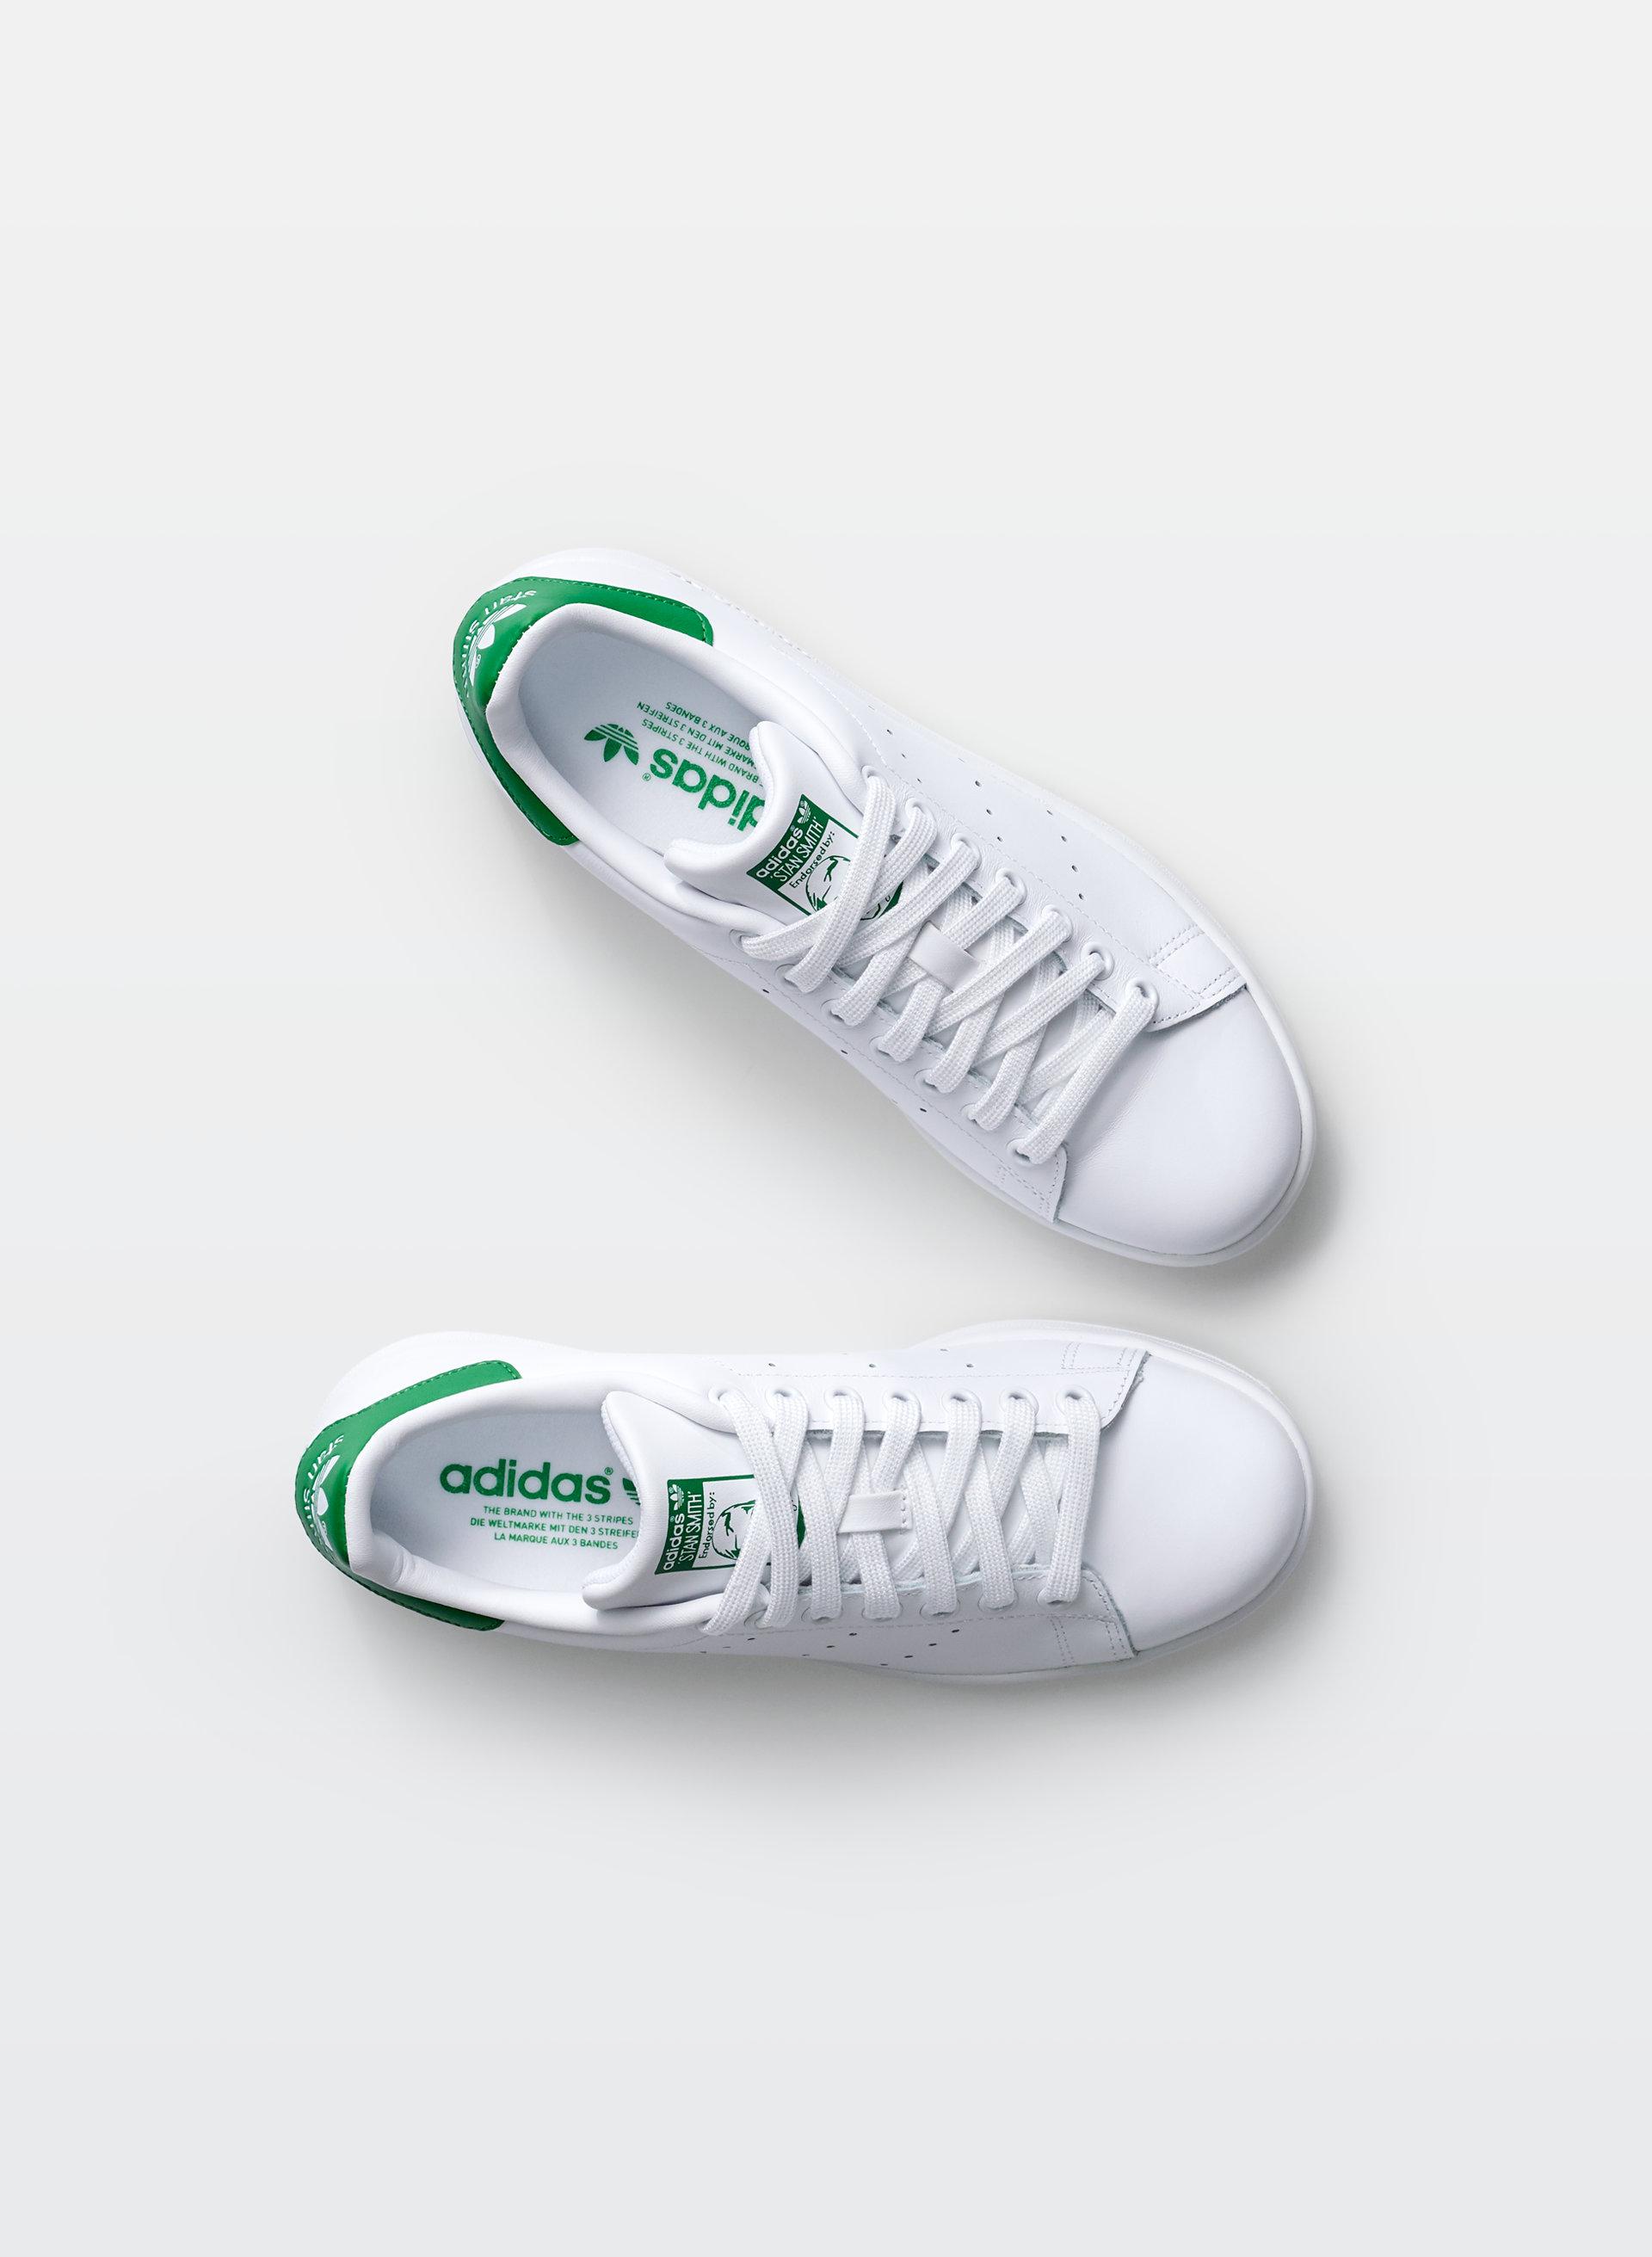 adidas stan smith shoes canada